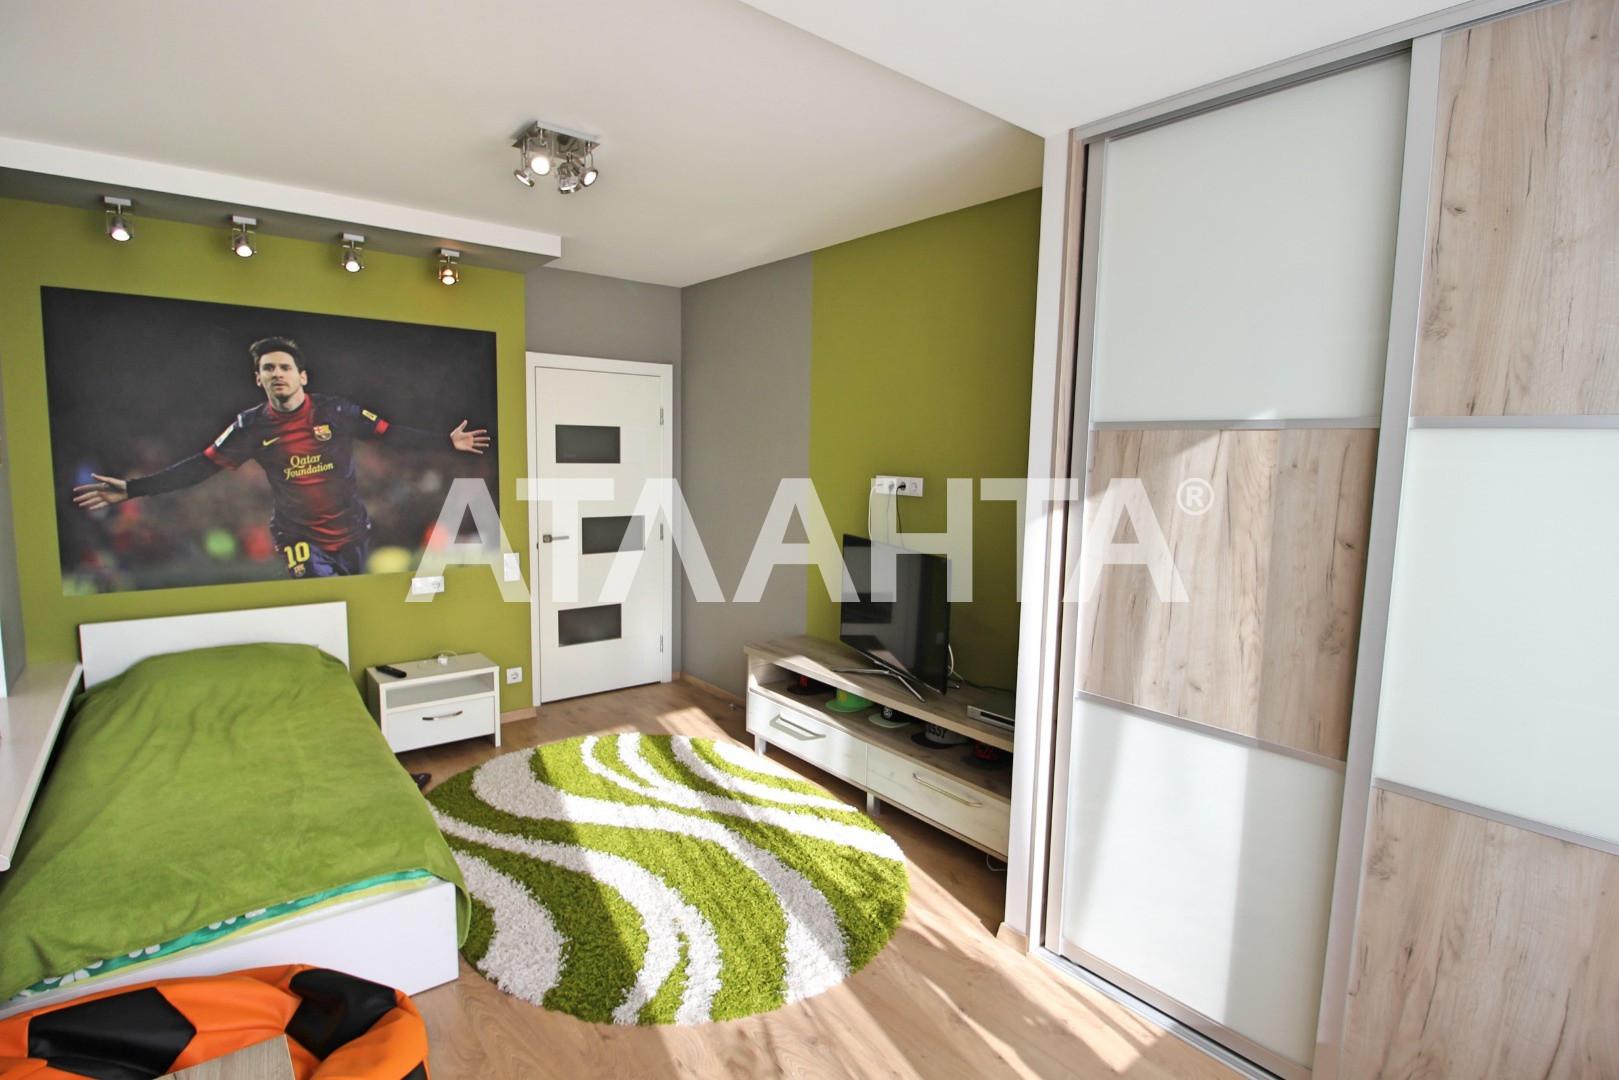 Продается 4-комнатная Квартира на ул. Ул. Богатырская — 175 000 у.е. (фото №8)